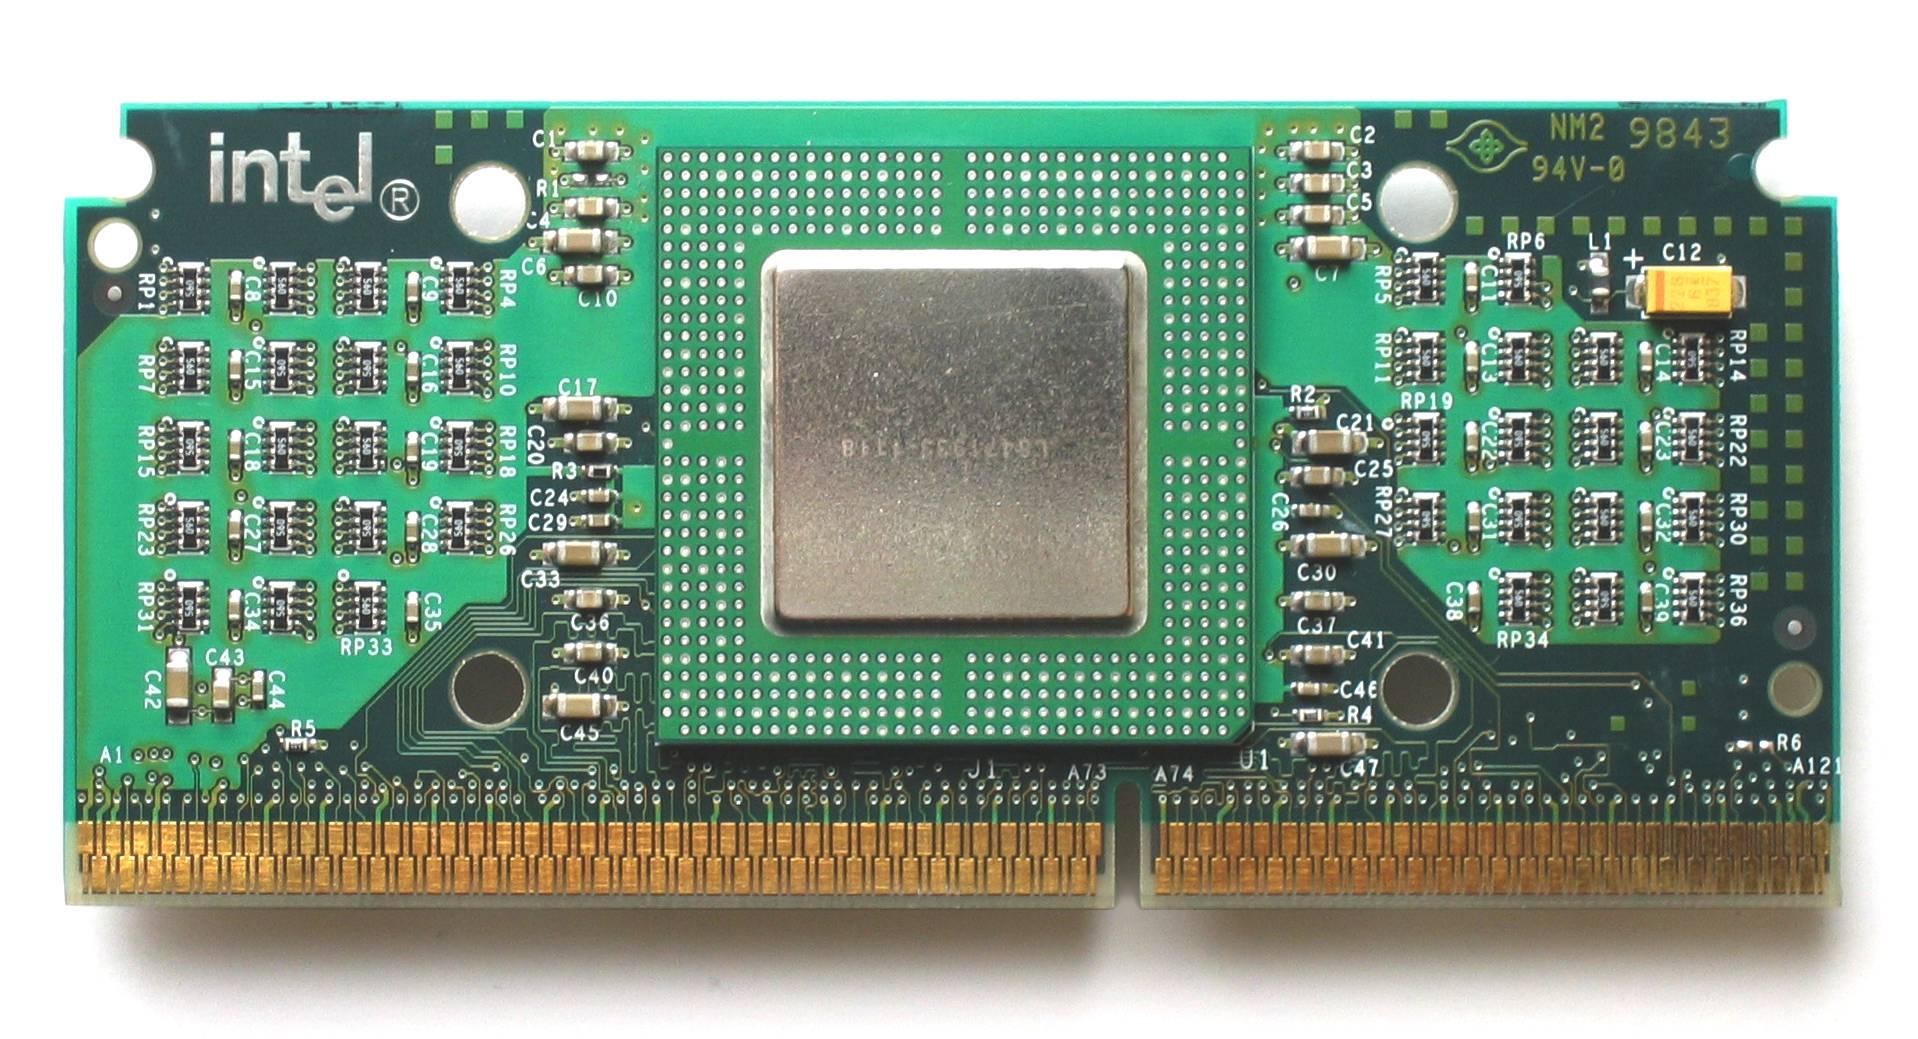 Intel_Celeron_300A_MHz.jpg